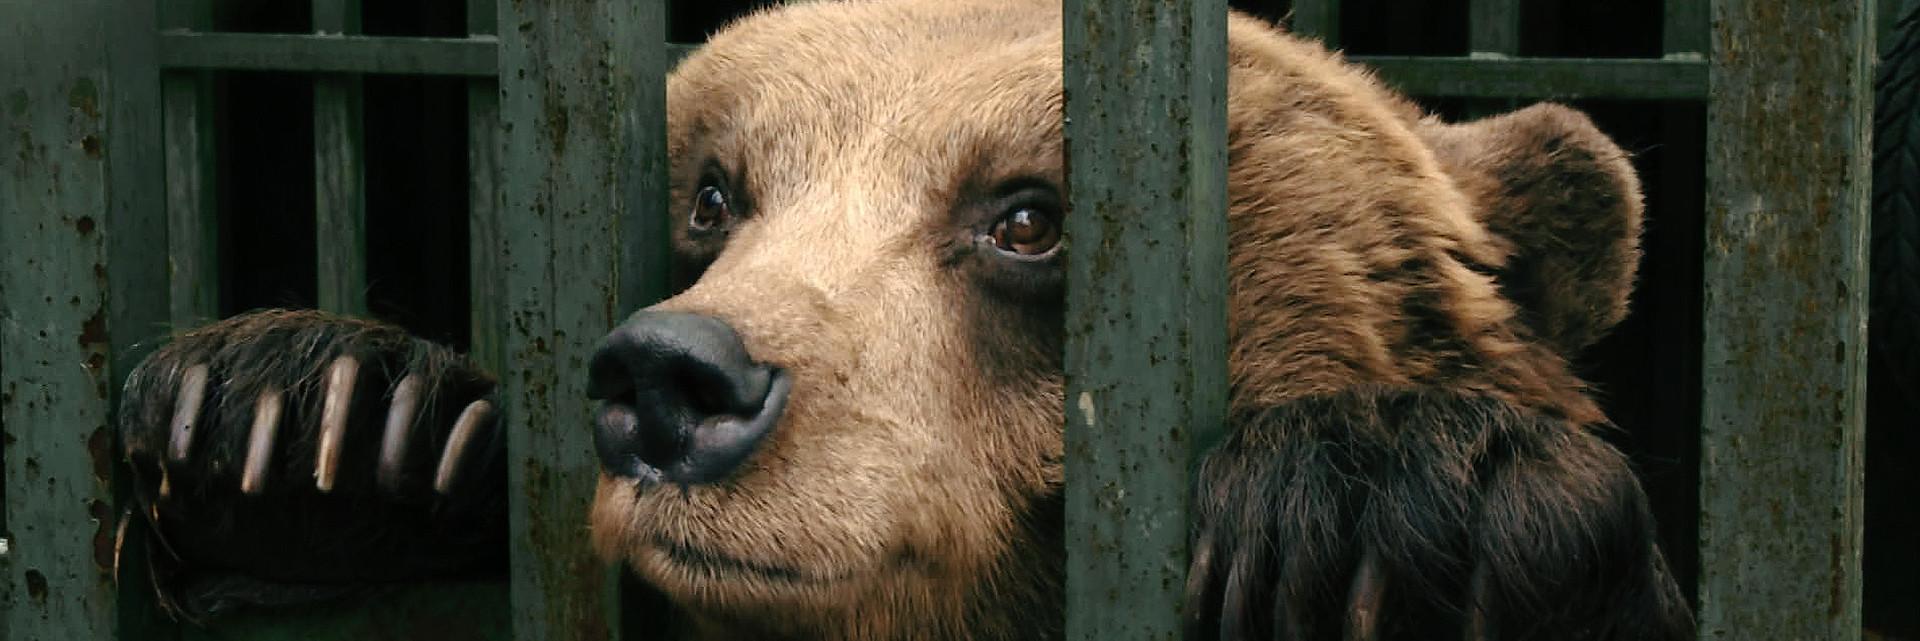 SOS Bären